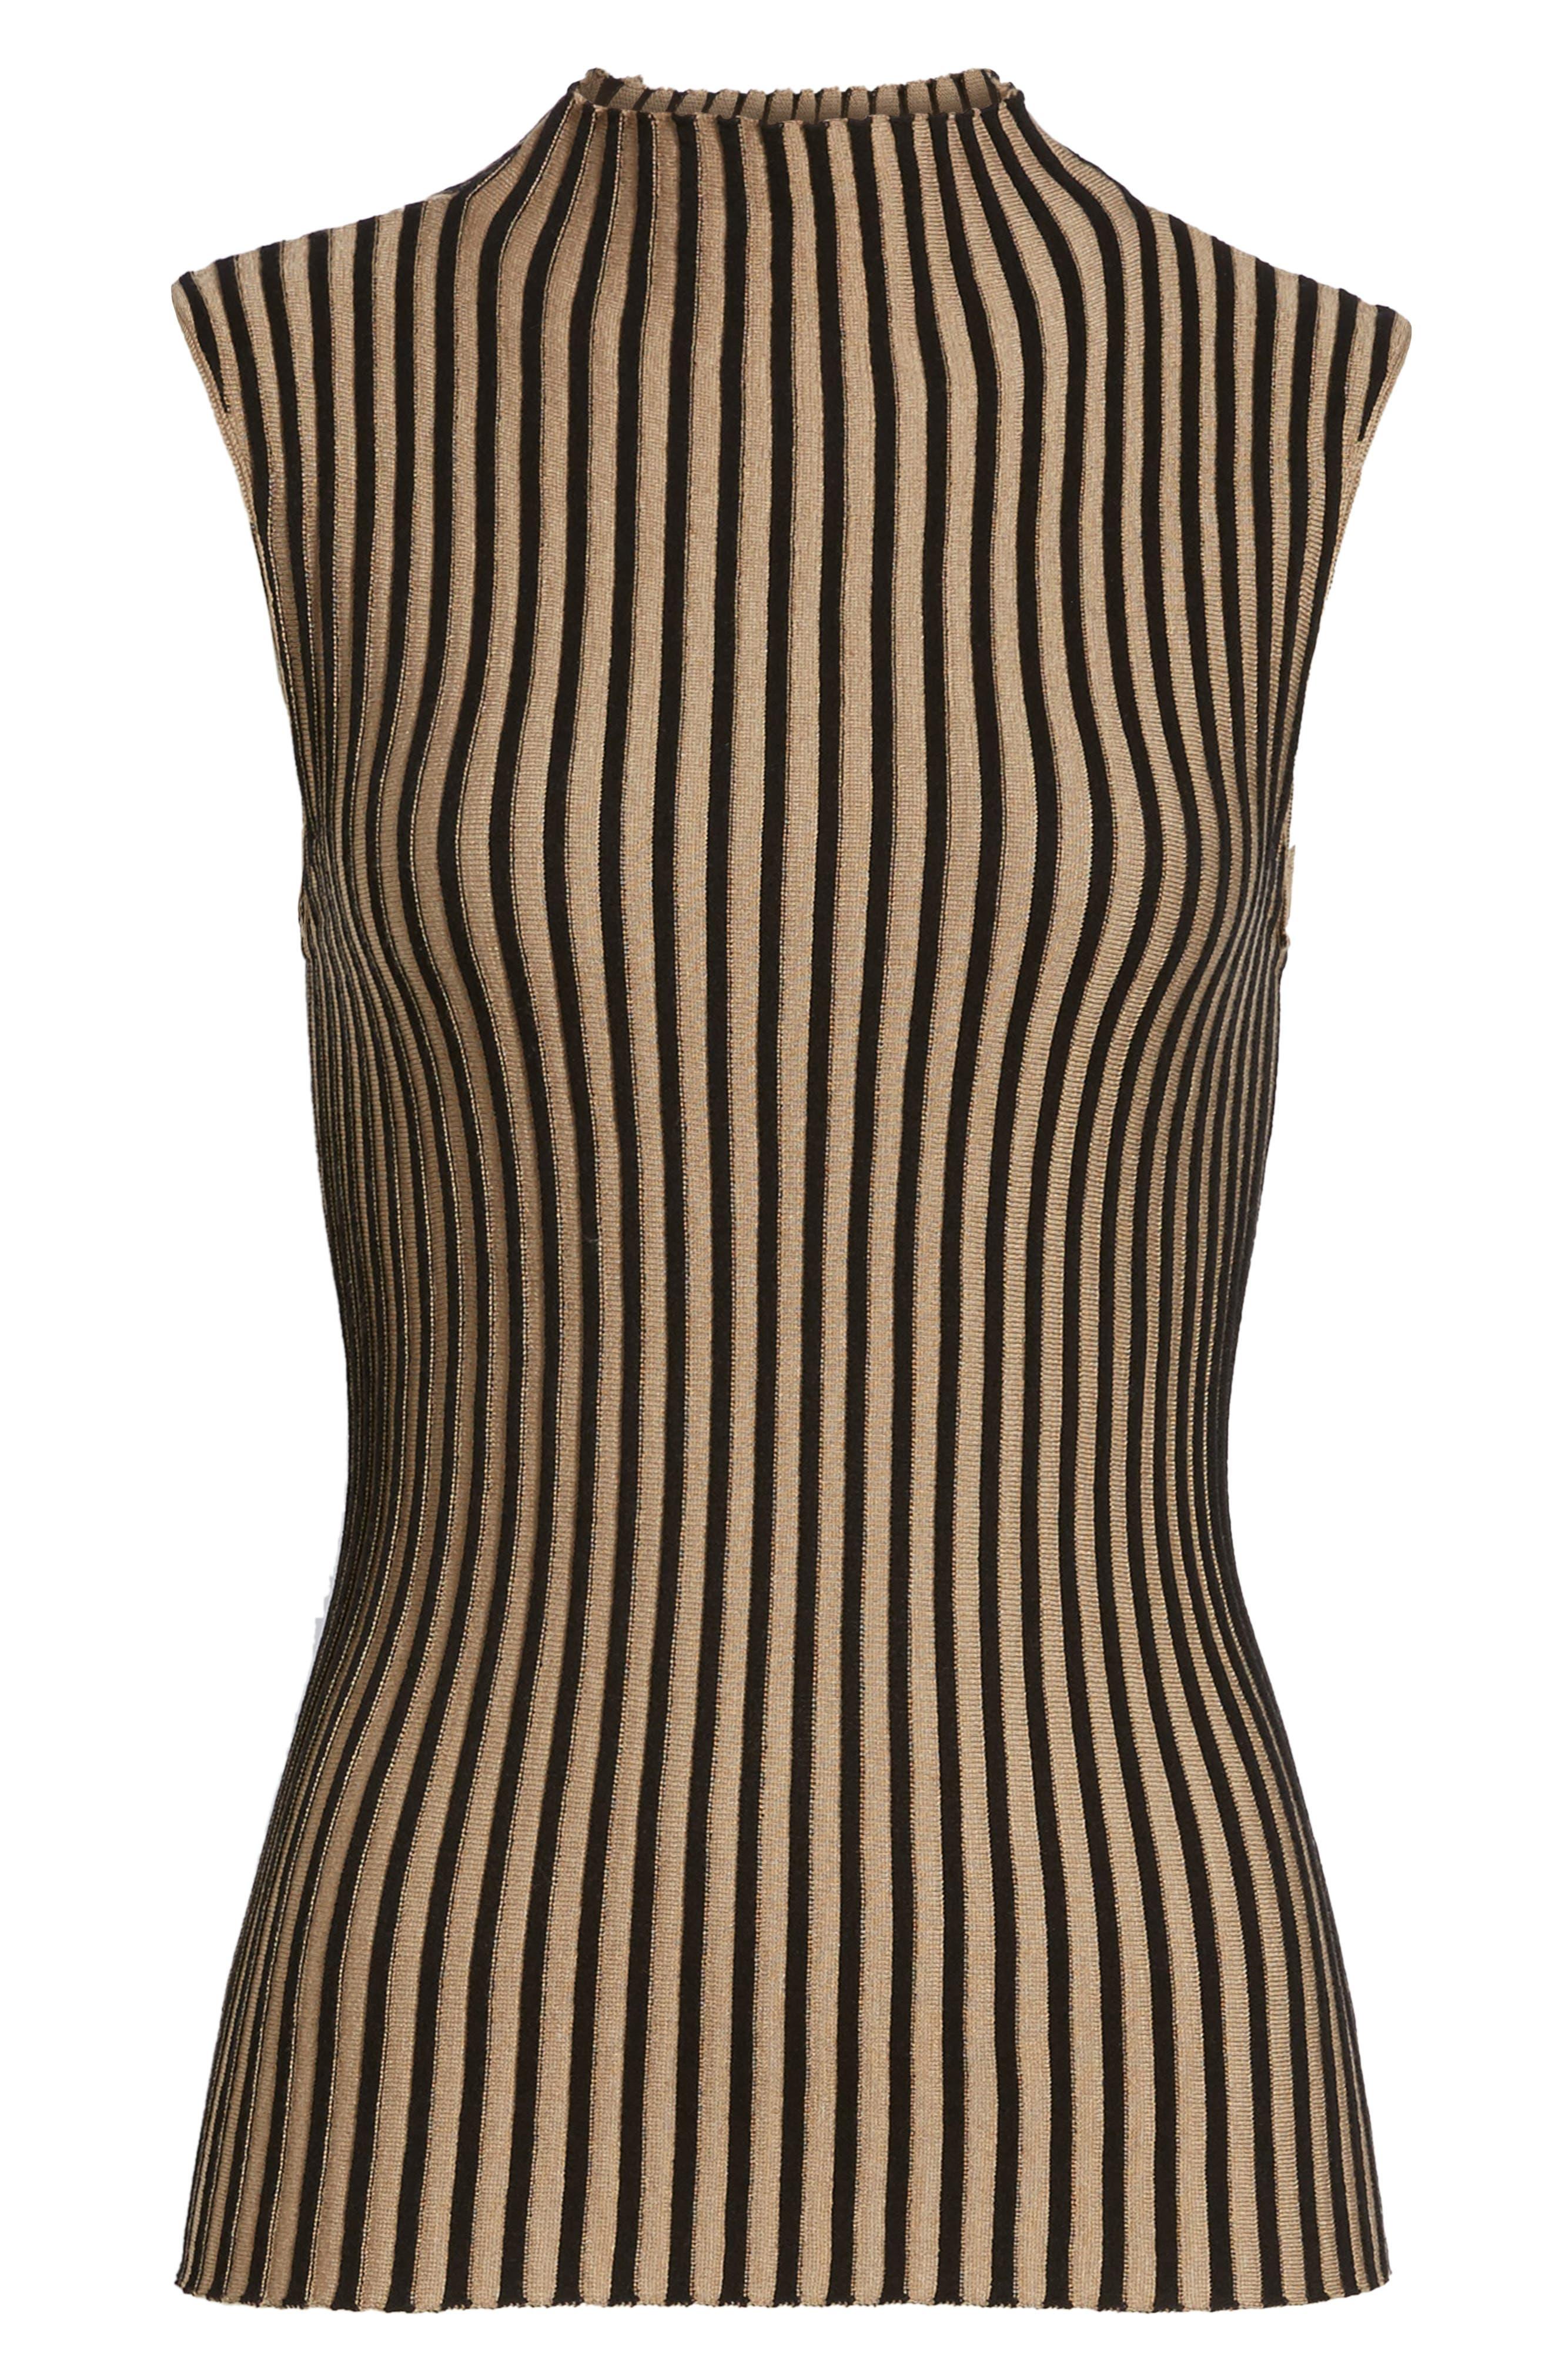 Stripe Sweater,                             Alternate thumbnail 6, color,                             010